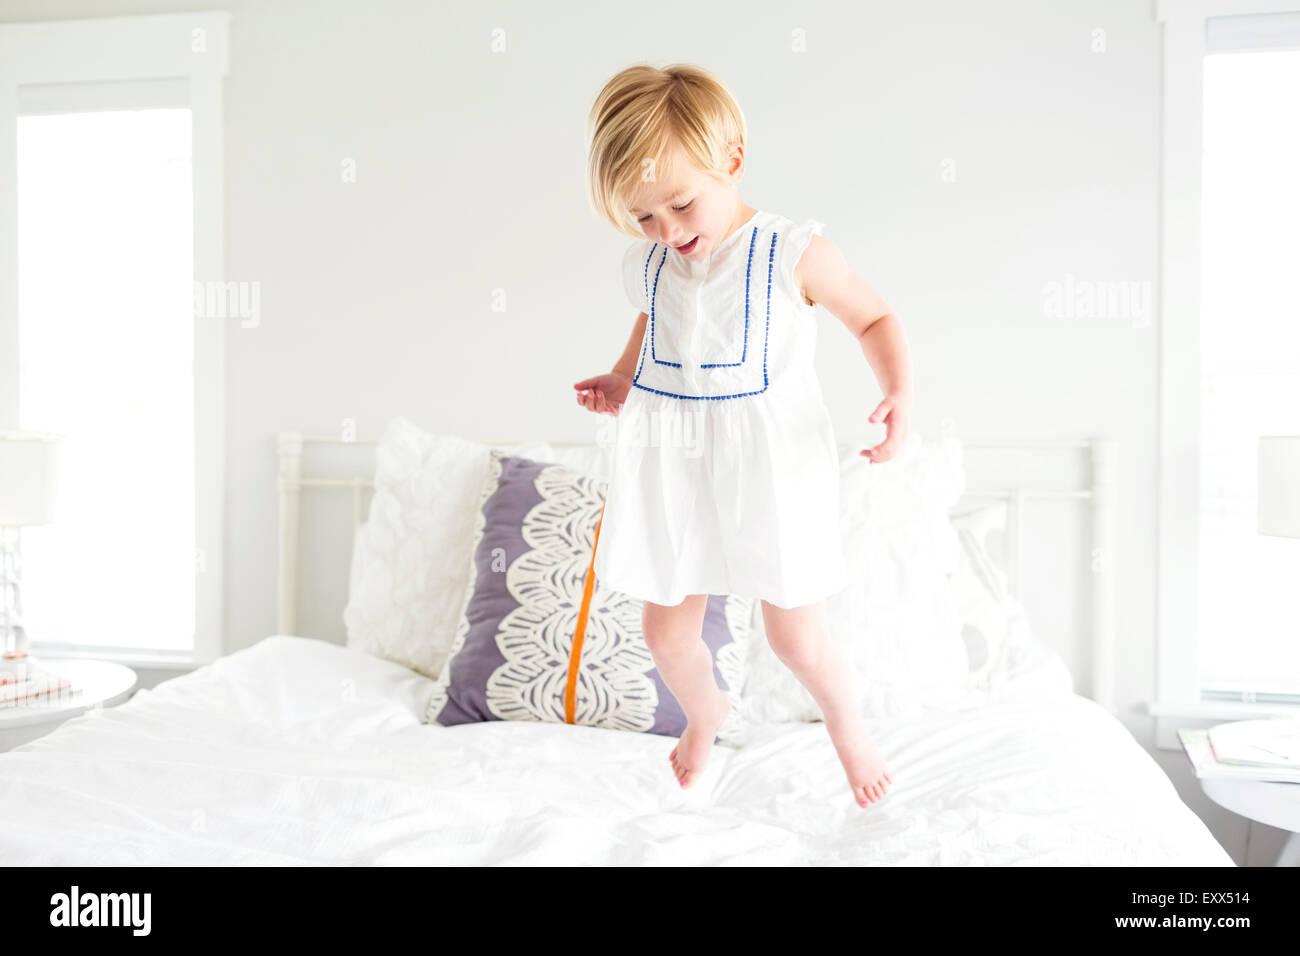 Mädchen (2-3) springen auf Bett Stockbild